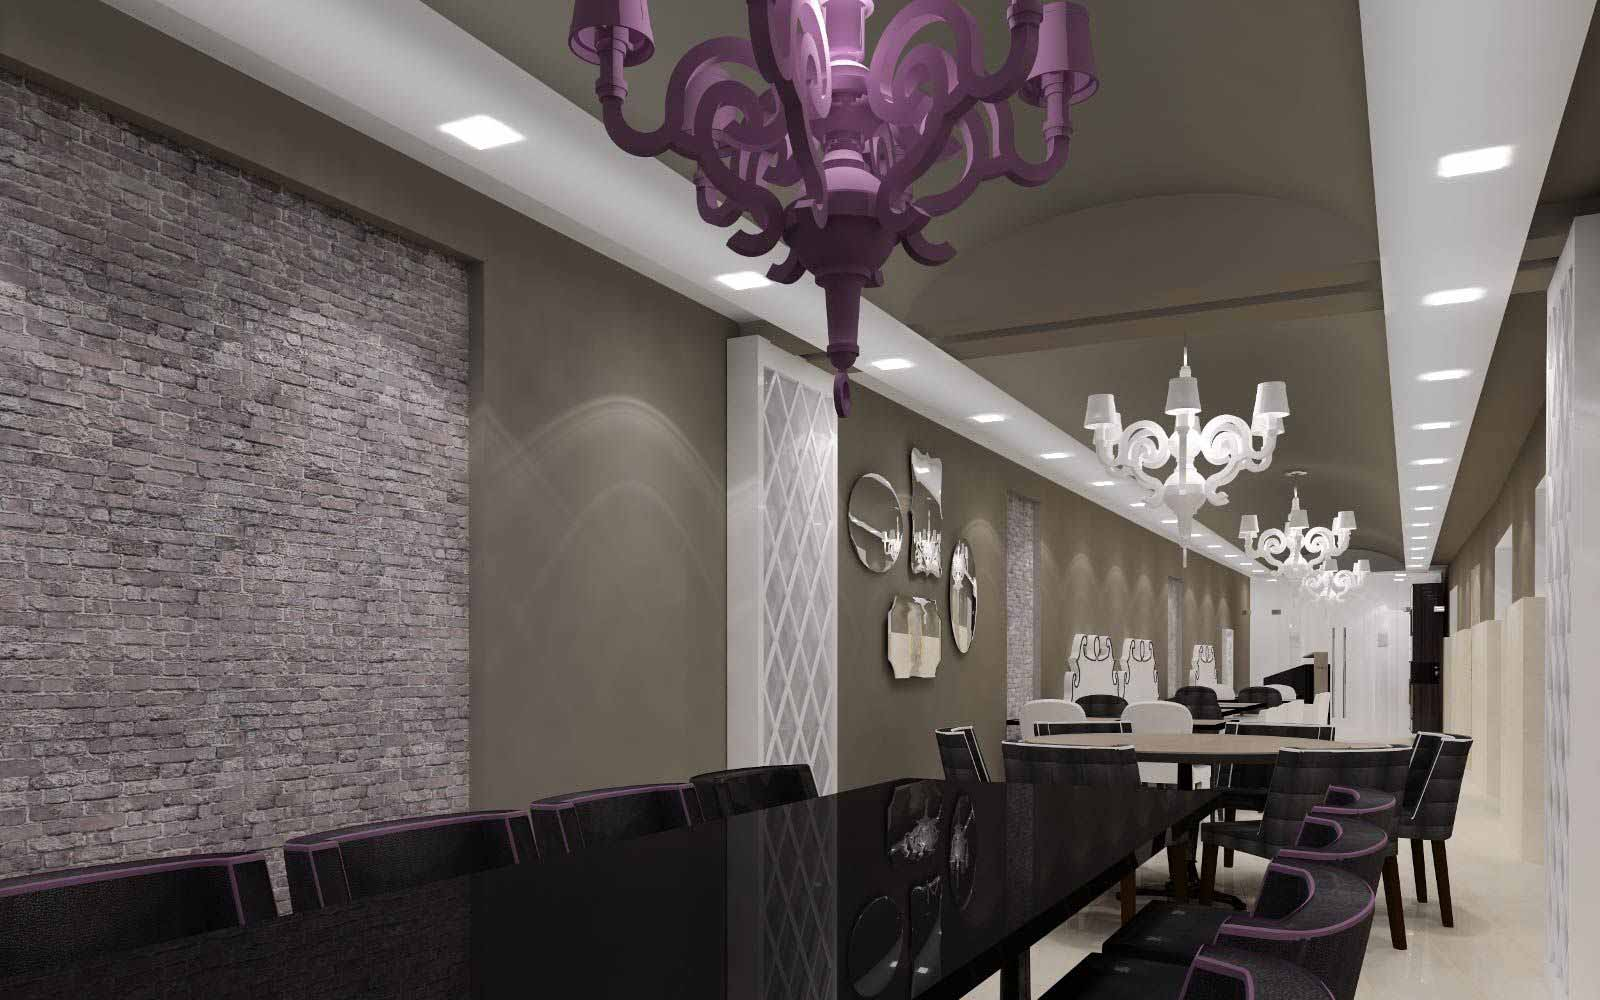 I Sofa restaurant at St George Hotel